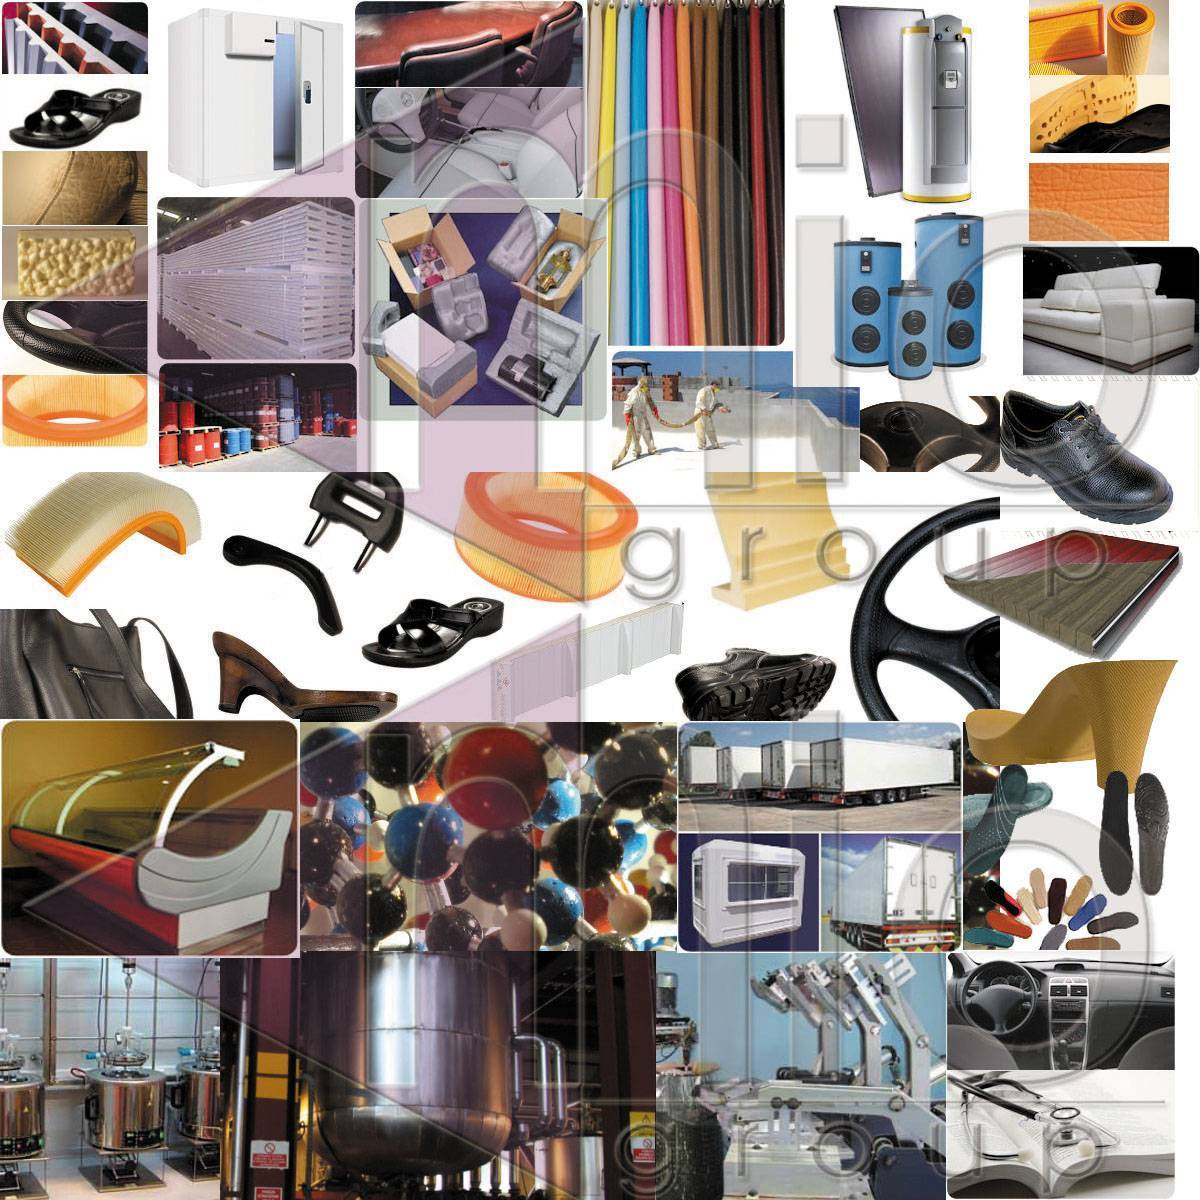 Polyurethane Systems (Rigid, Slipper-Sole, Integral, Flexible, Coating, Coagulation, Filter)